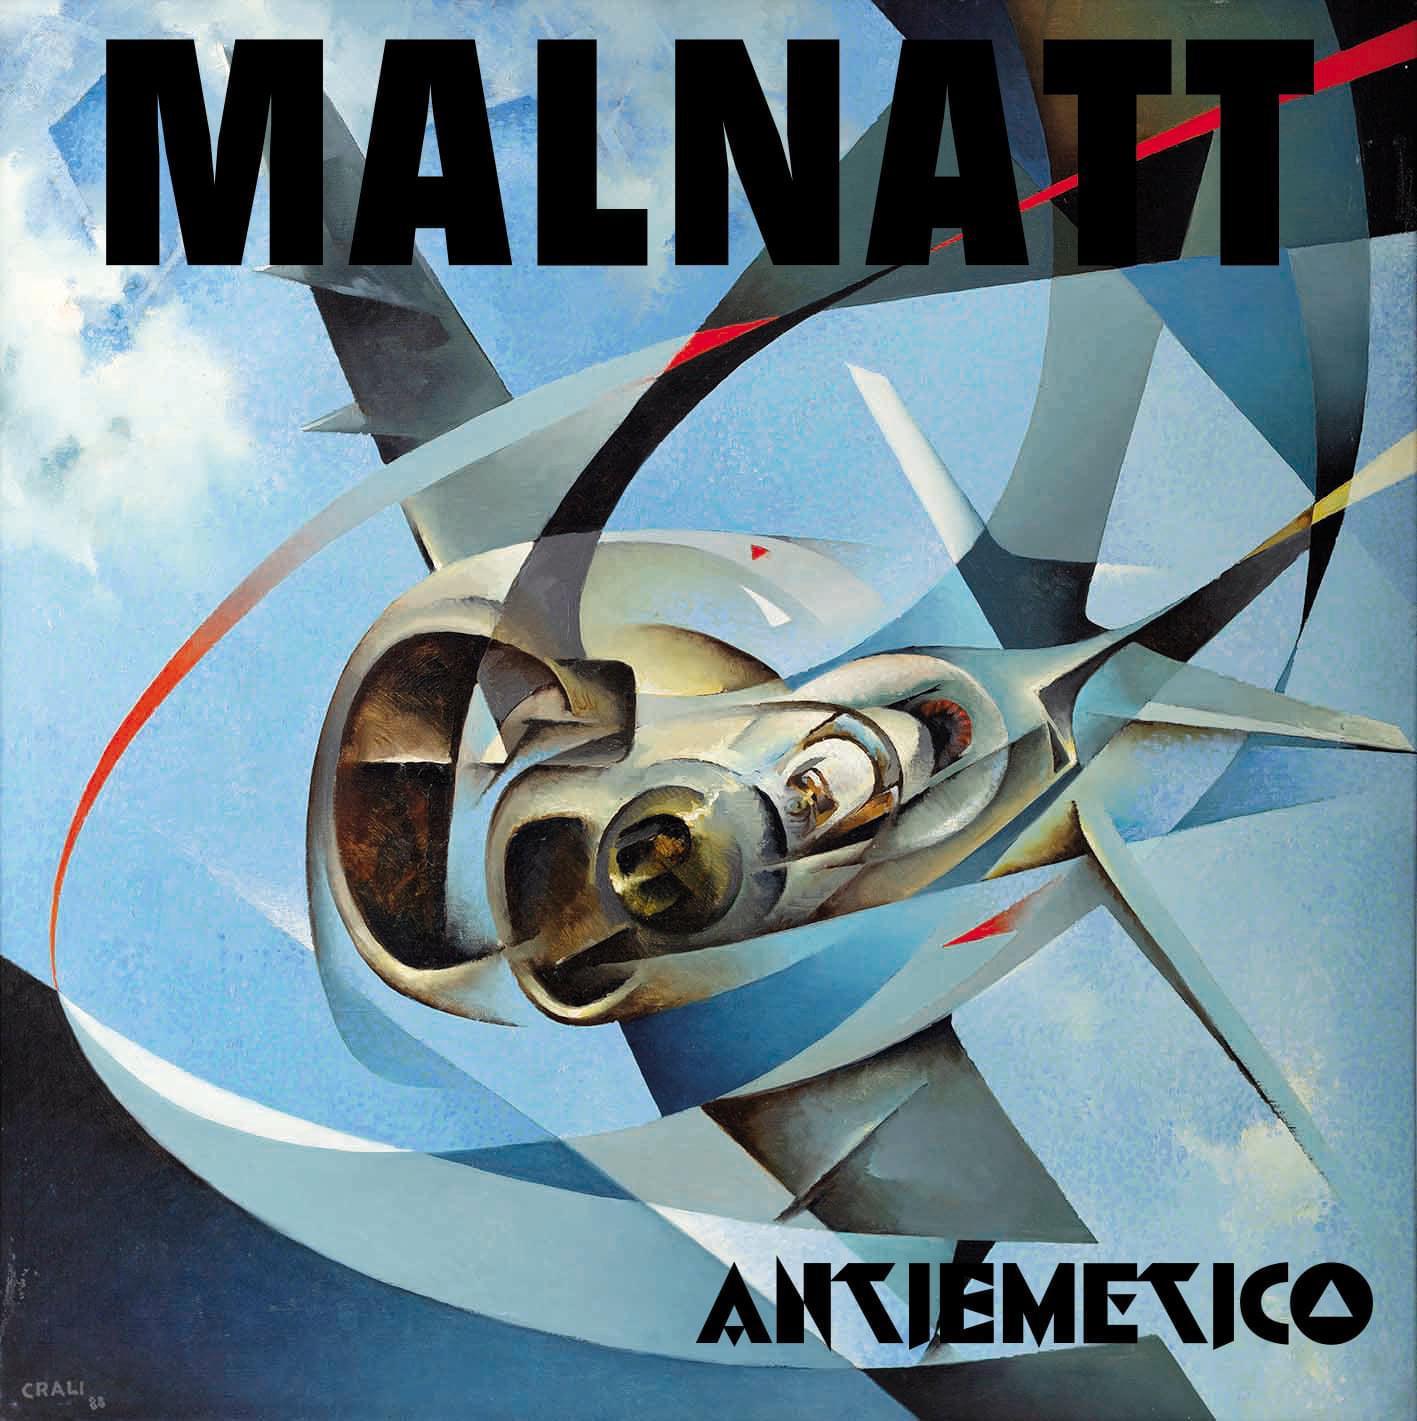 Malnatt – Antiemetico